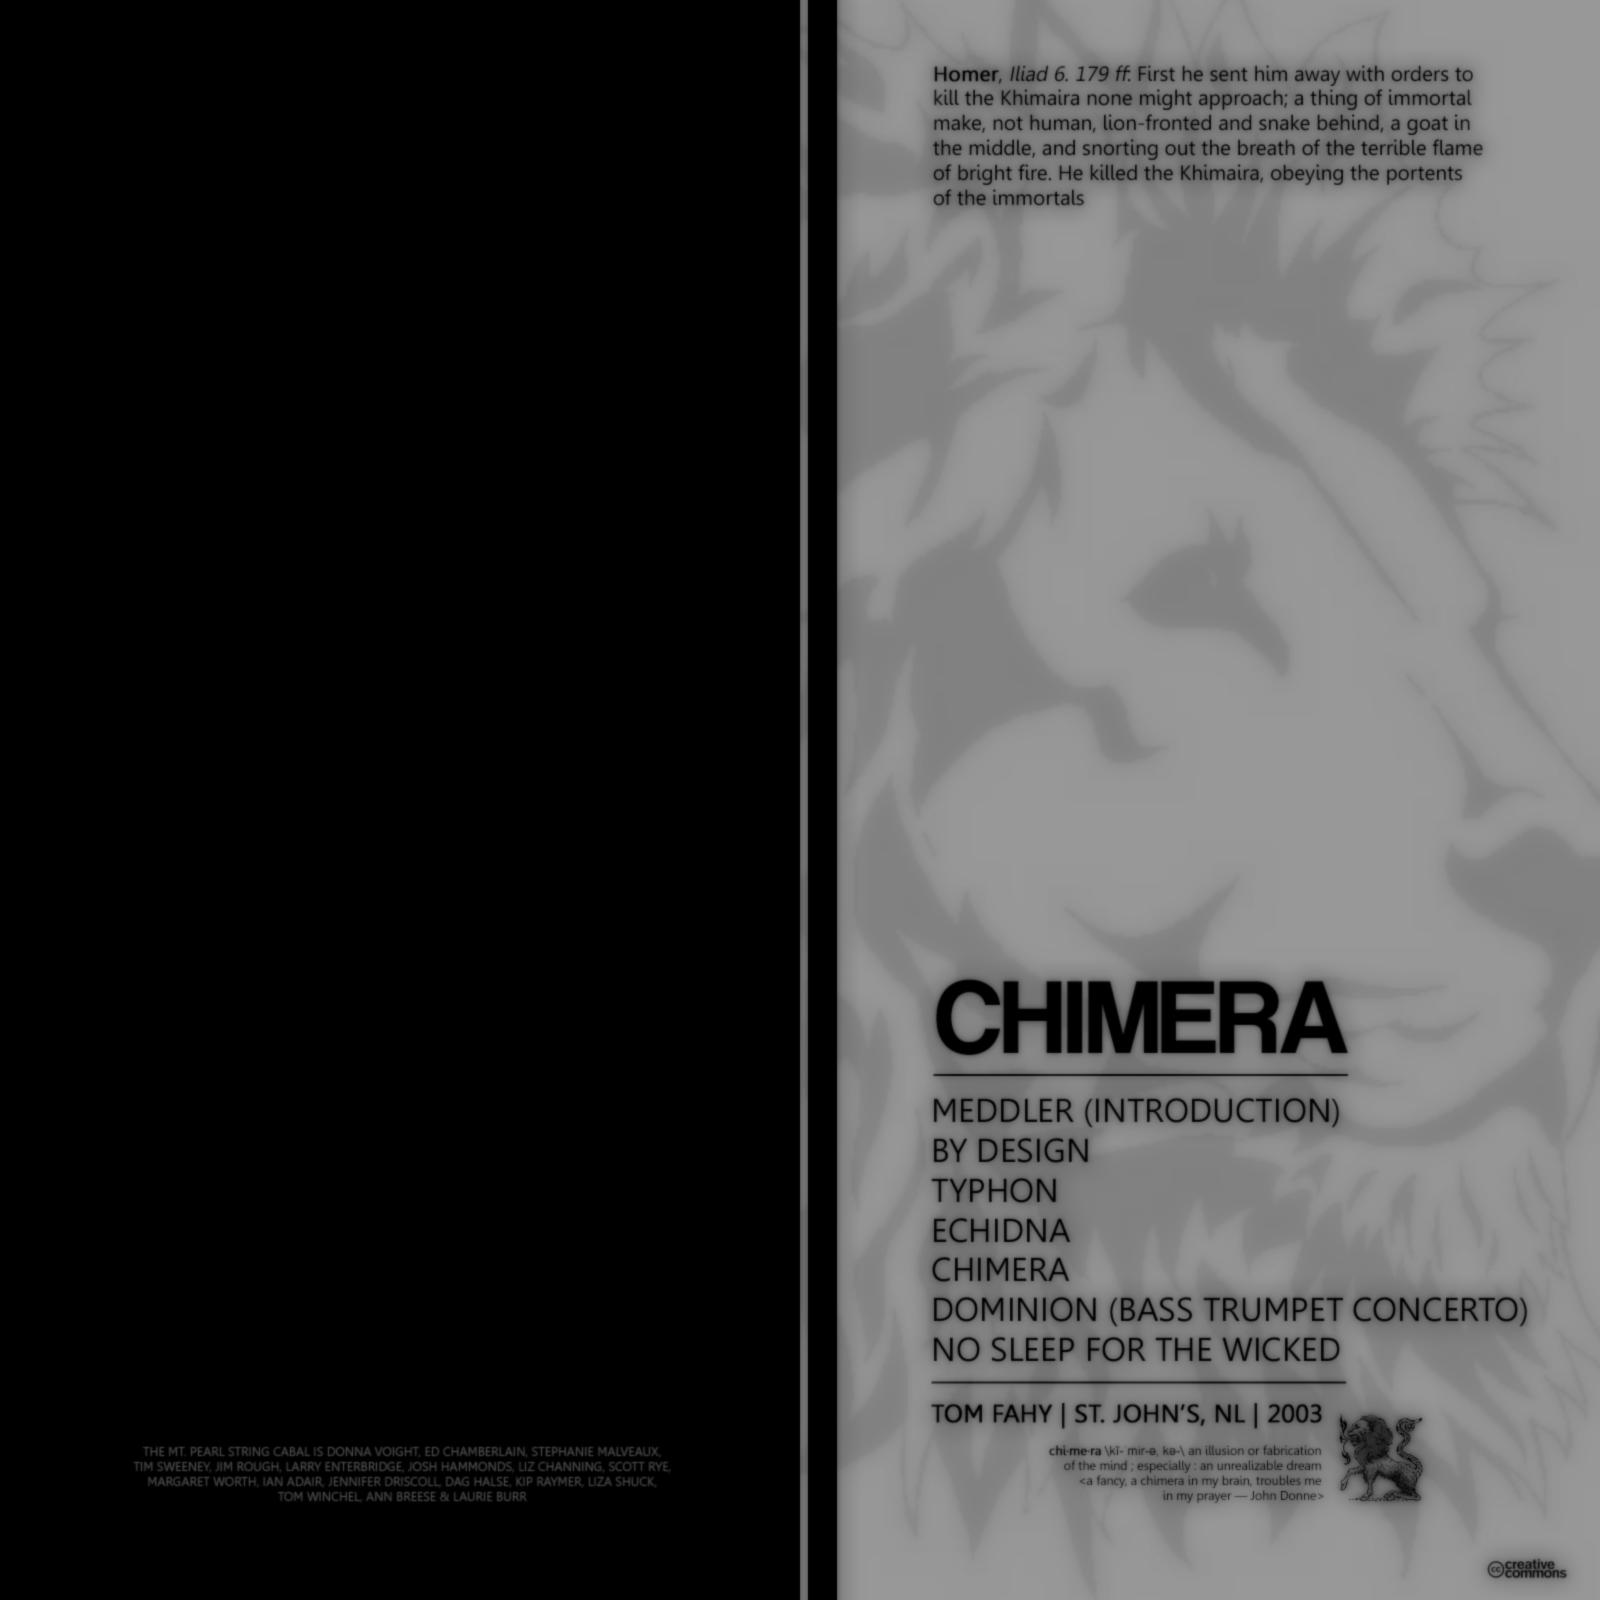 Chimera by Tom Fahy